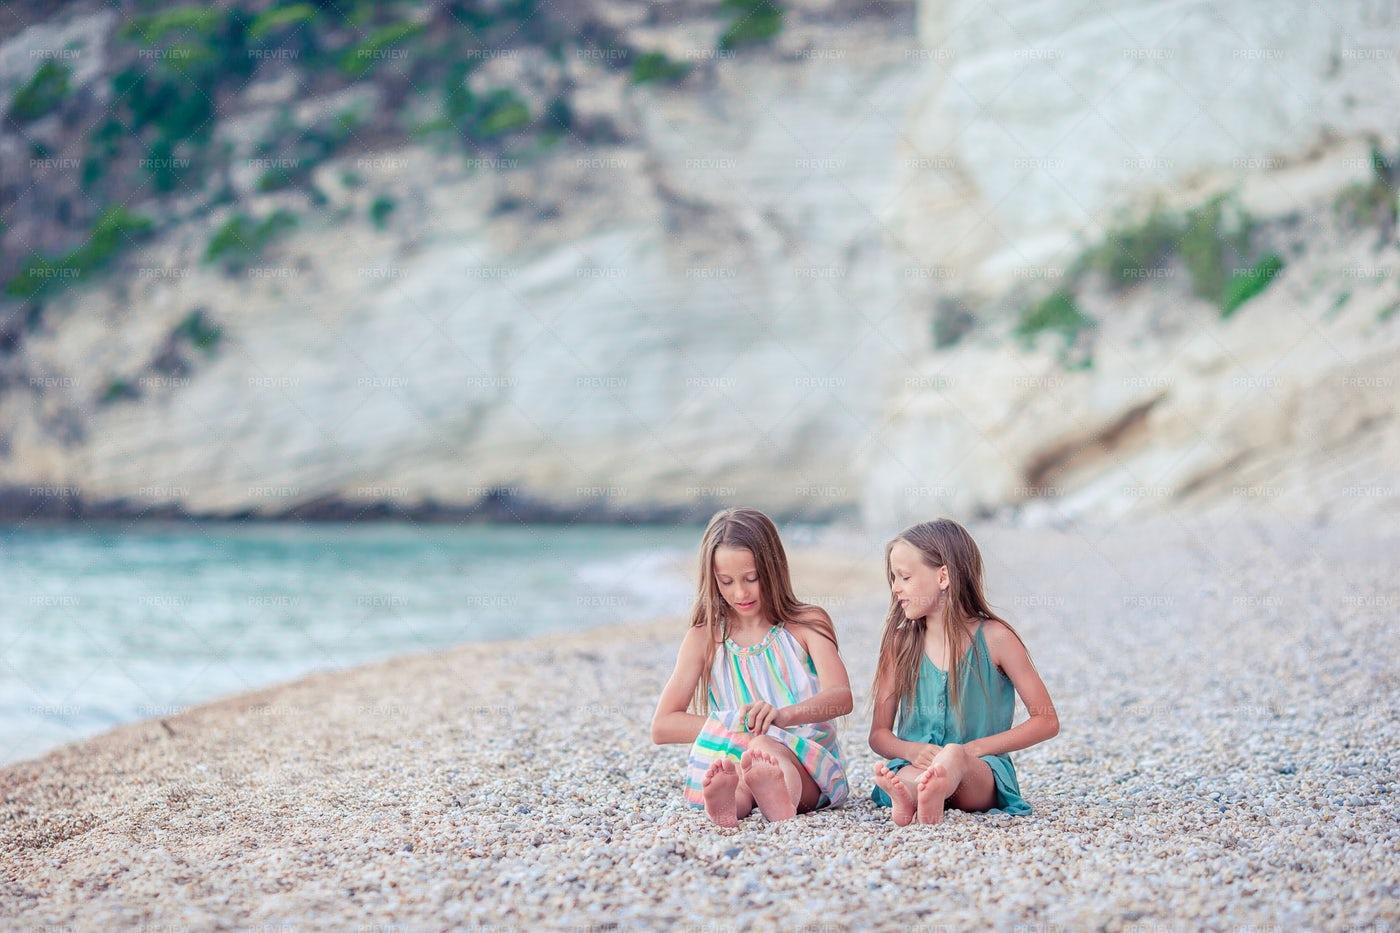 Sisters Sitting On Beach: Stock Photos